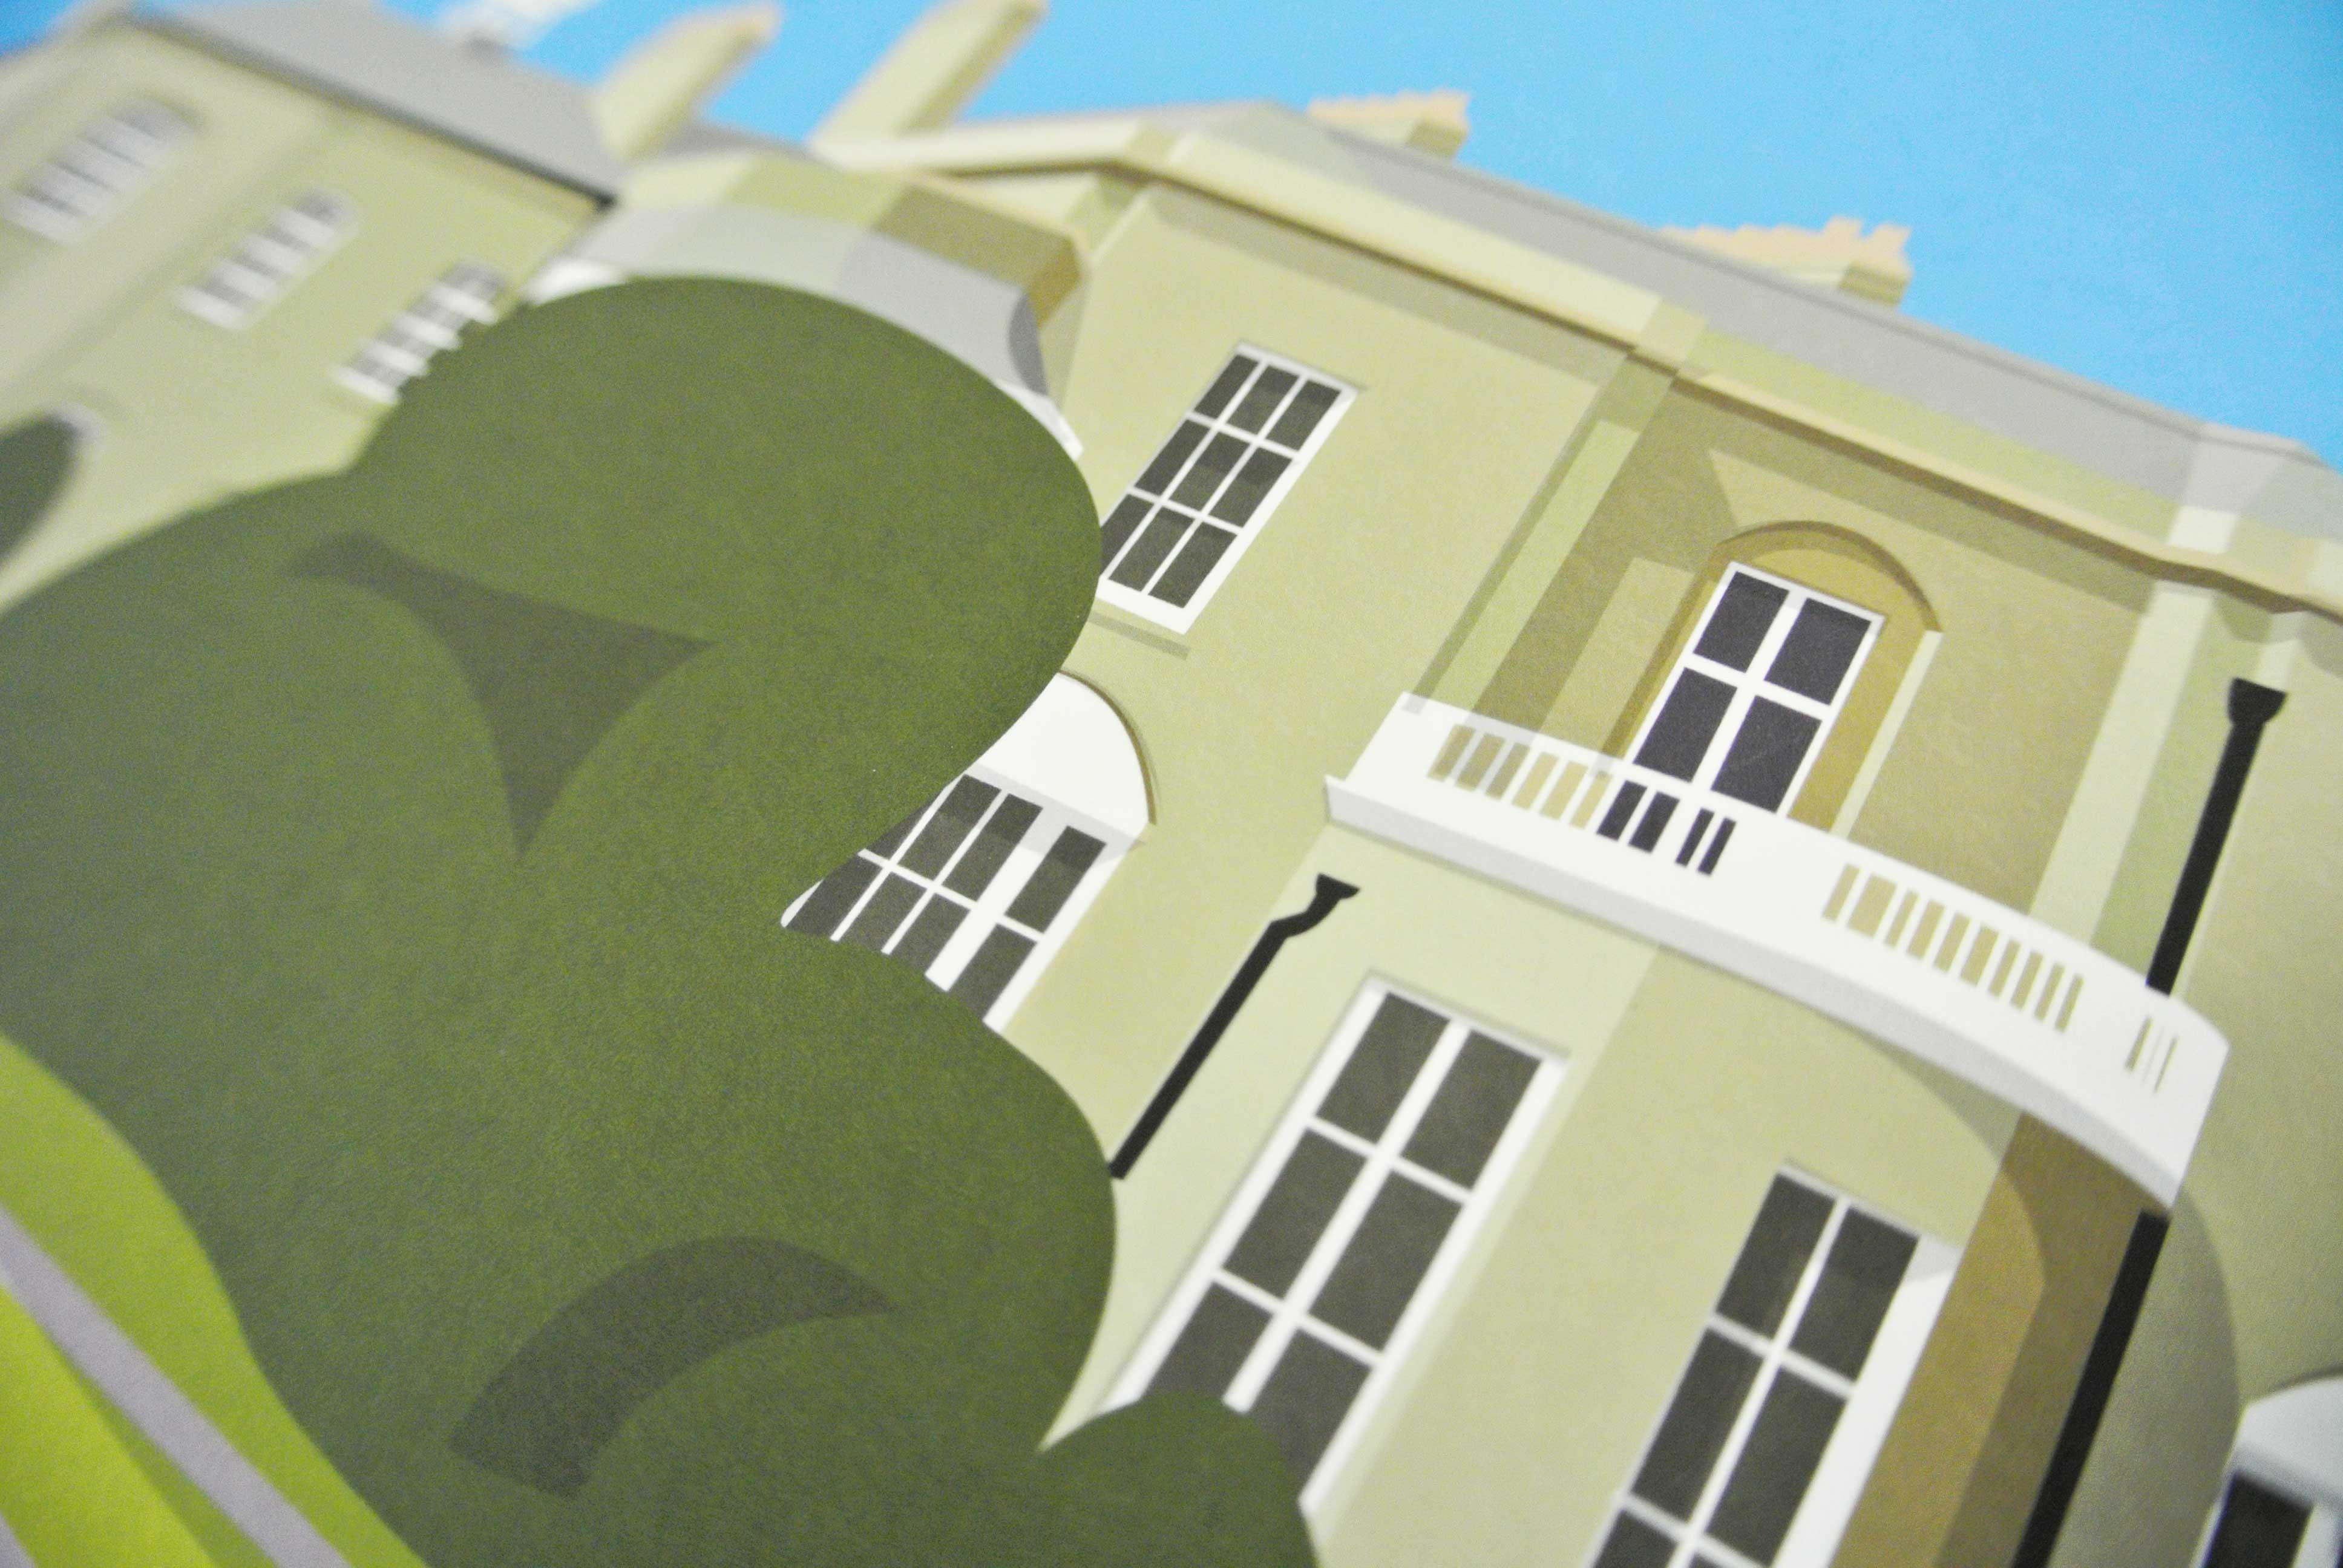 Brockwell Hall Art Poster Print Detail